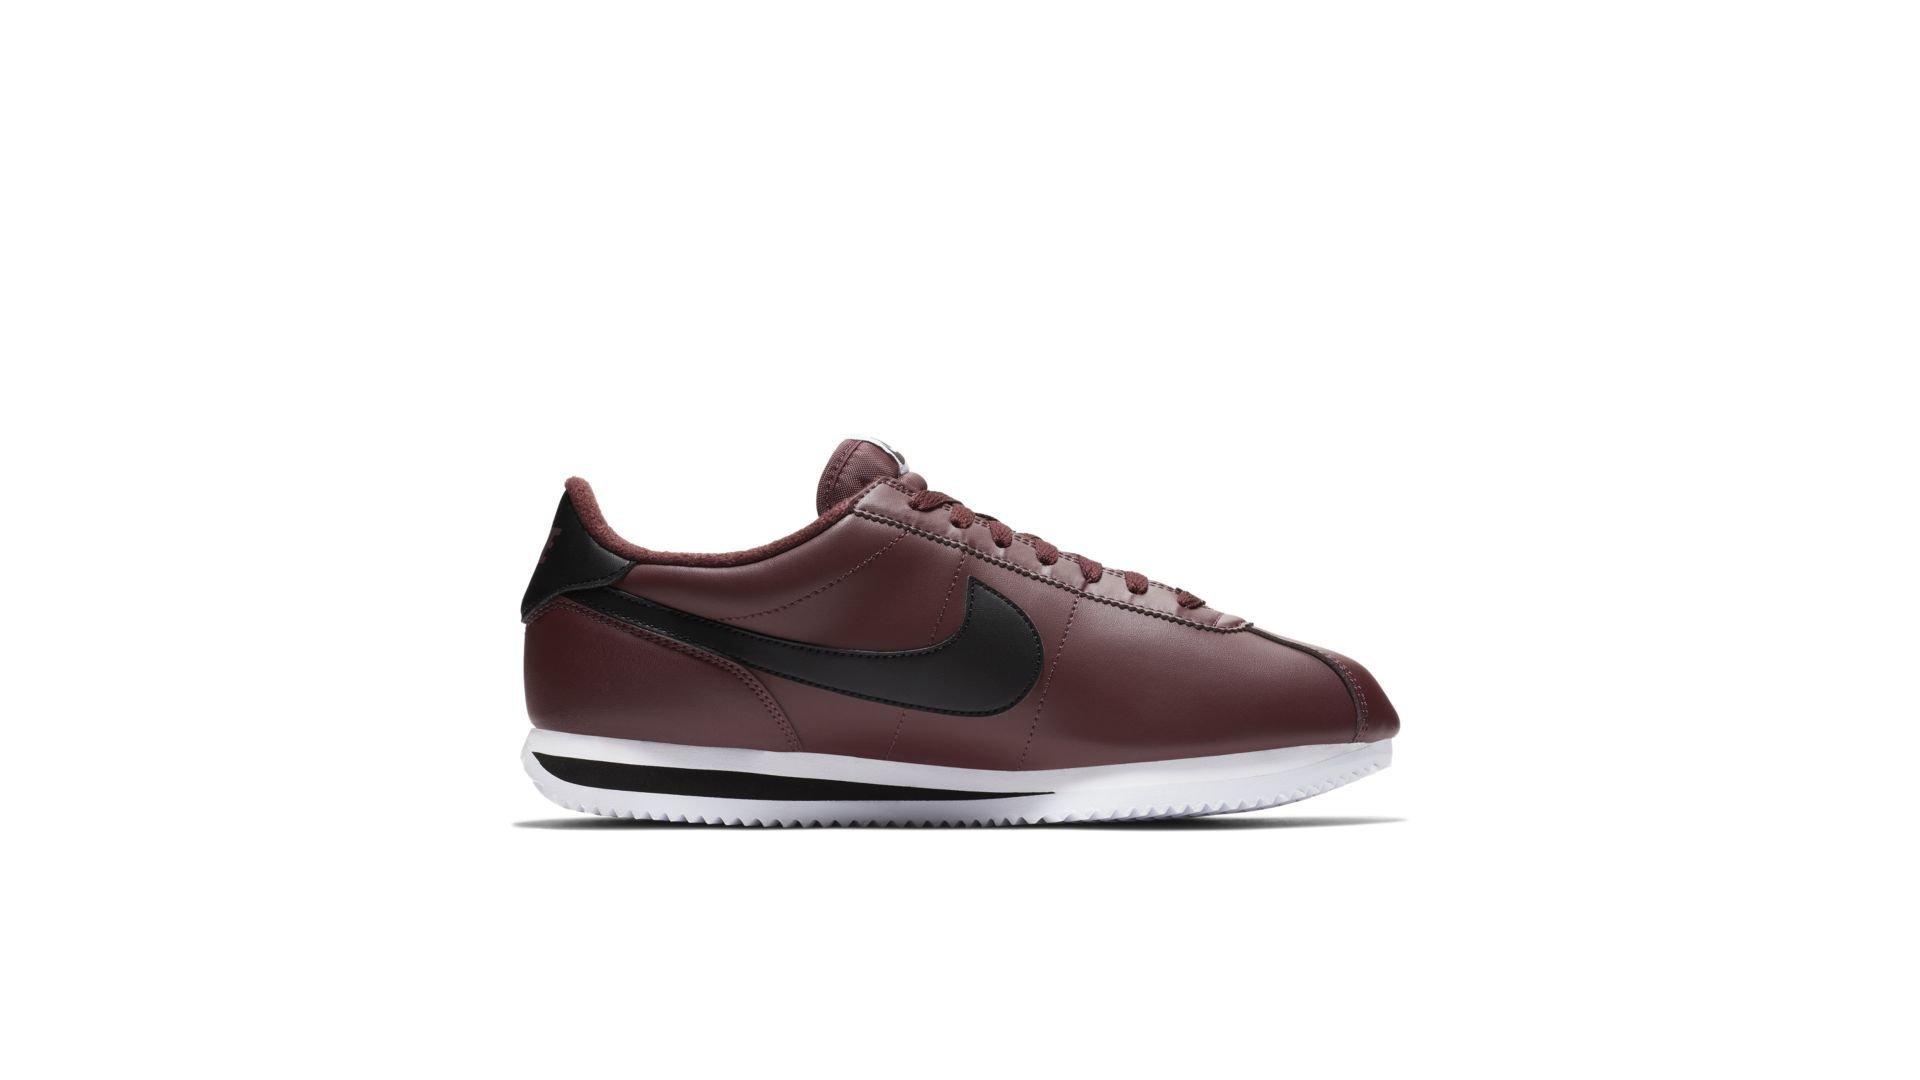 Nike Cortez Leather Burgundy Crush (819719-600)